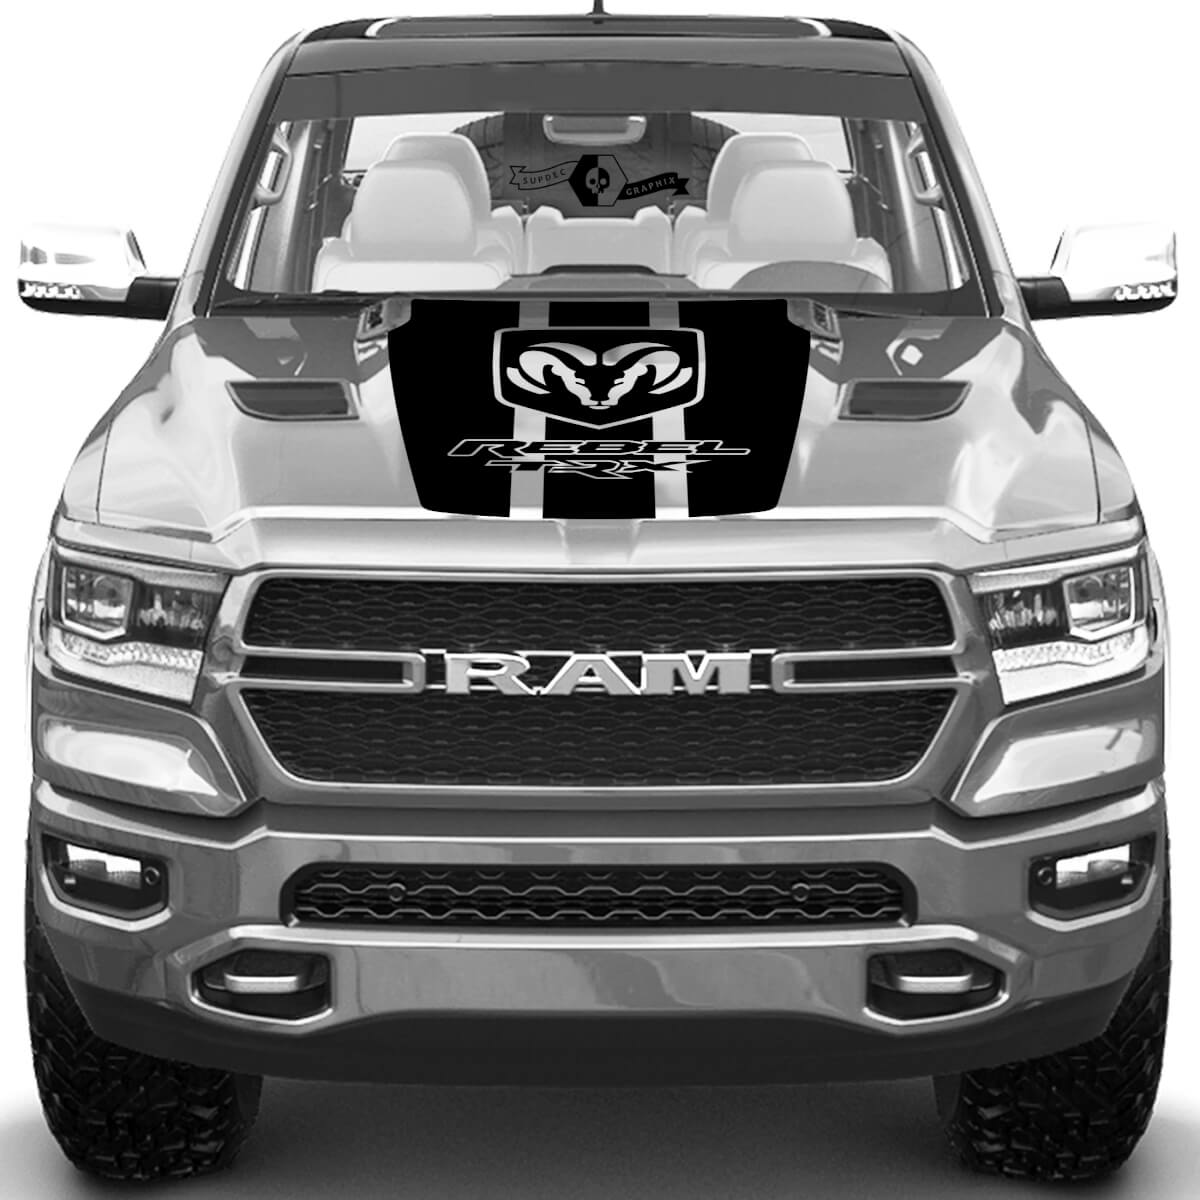 Dodge Ram Rebel TRX 2021+ Hood Truck Vinyl Aufkleber Grafik